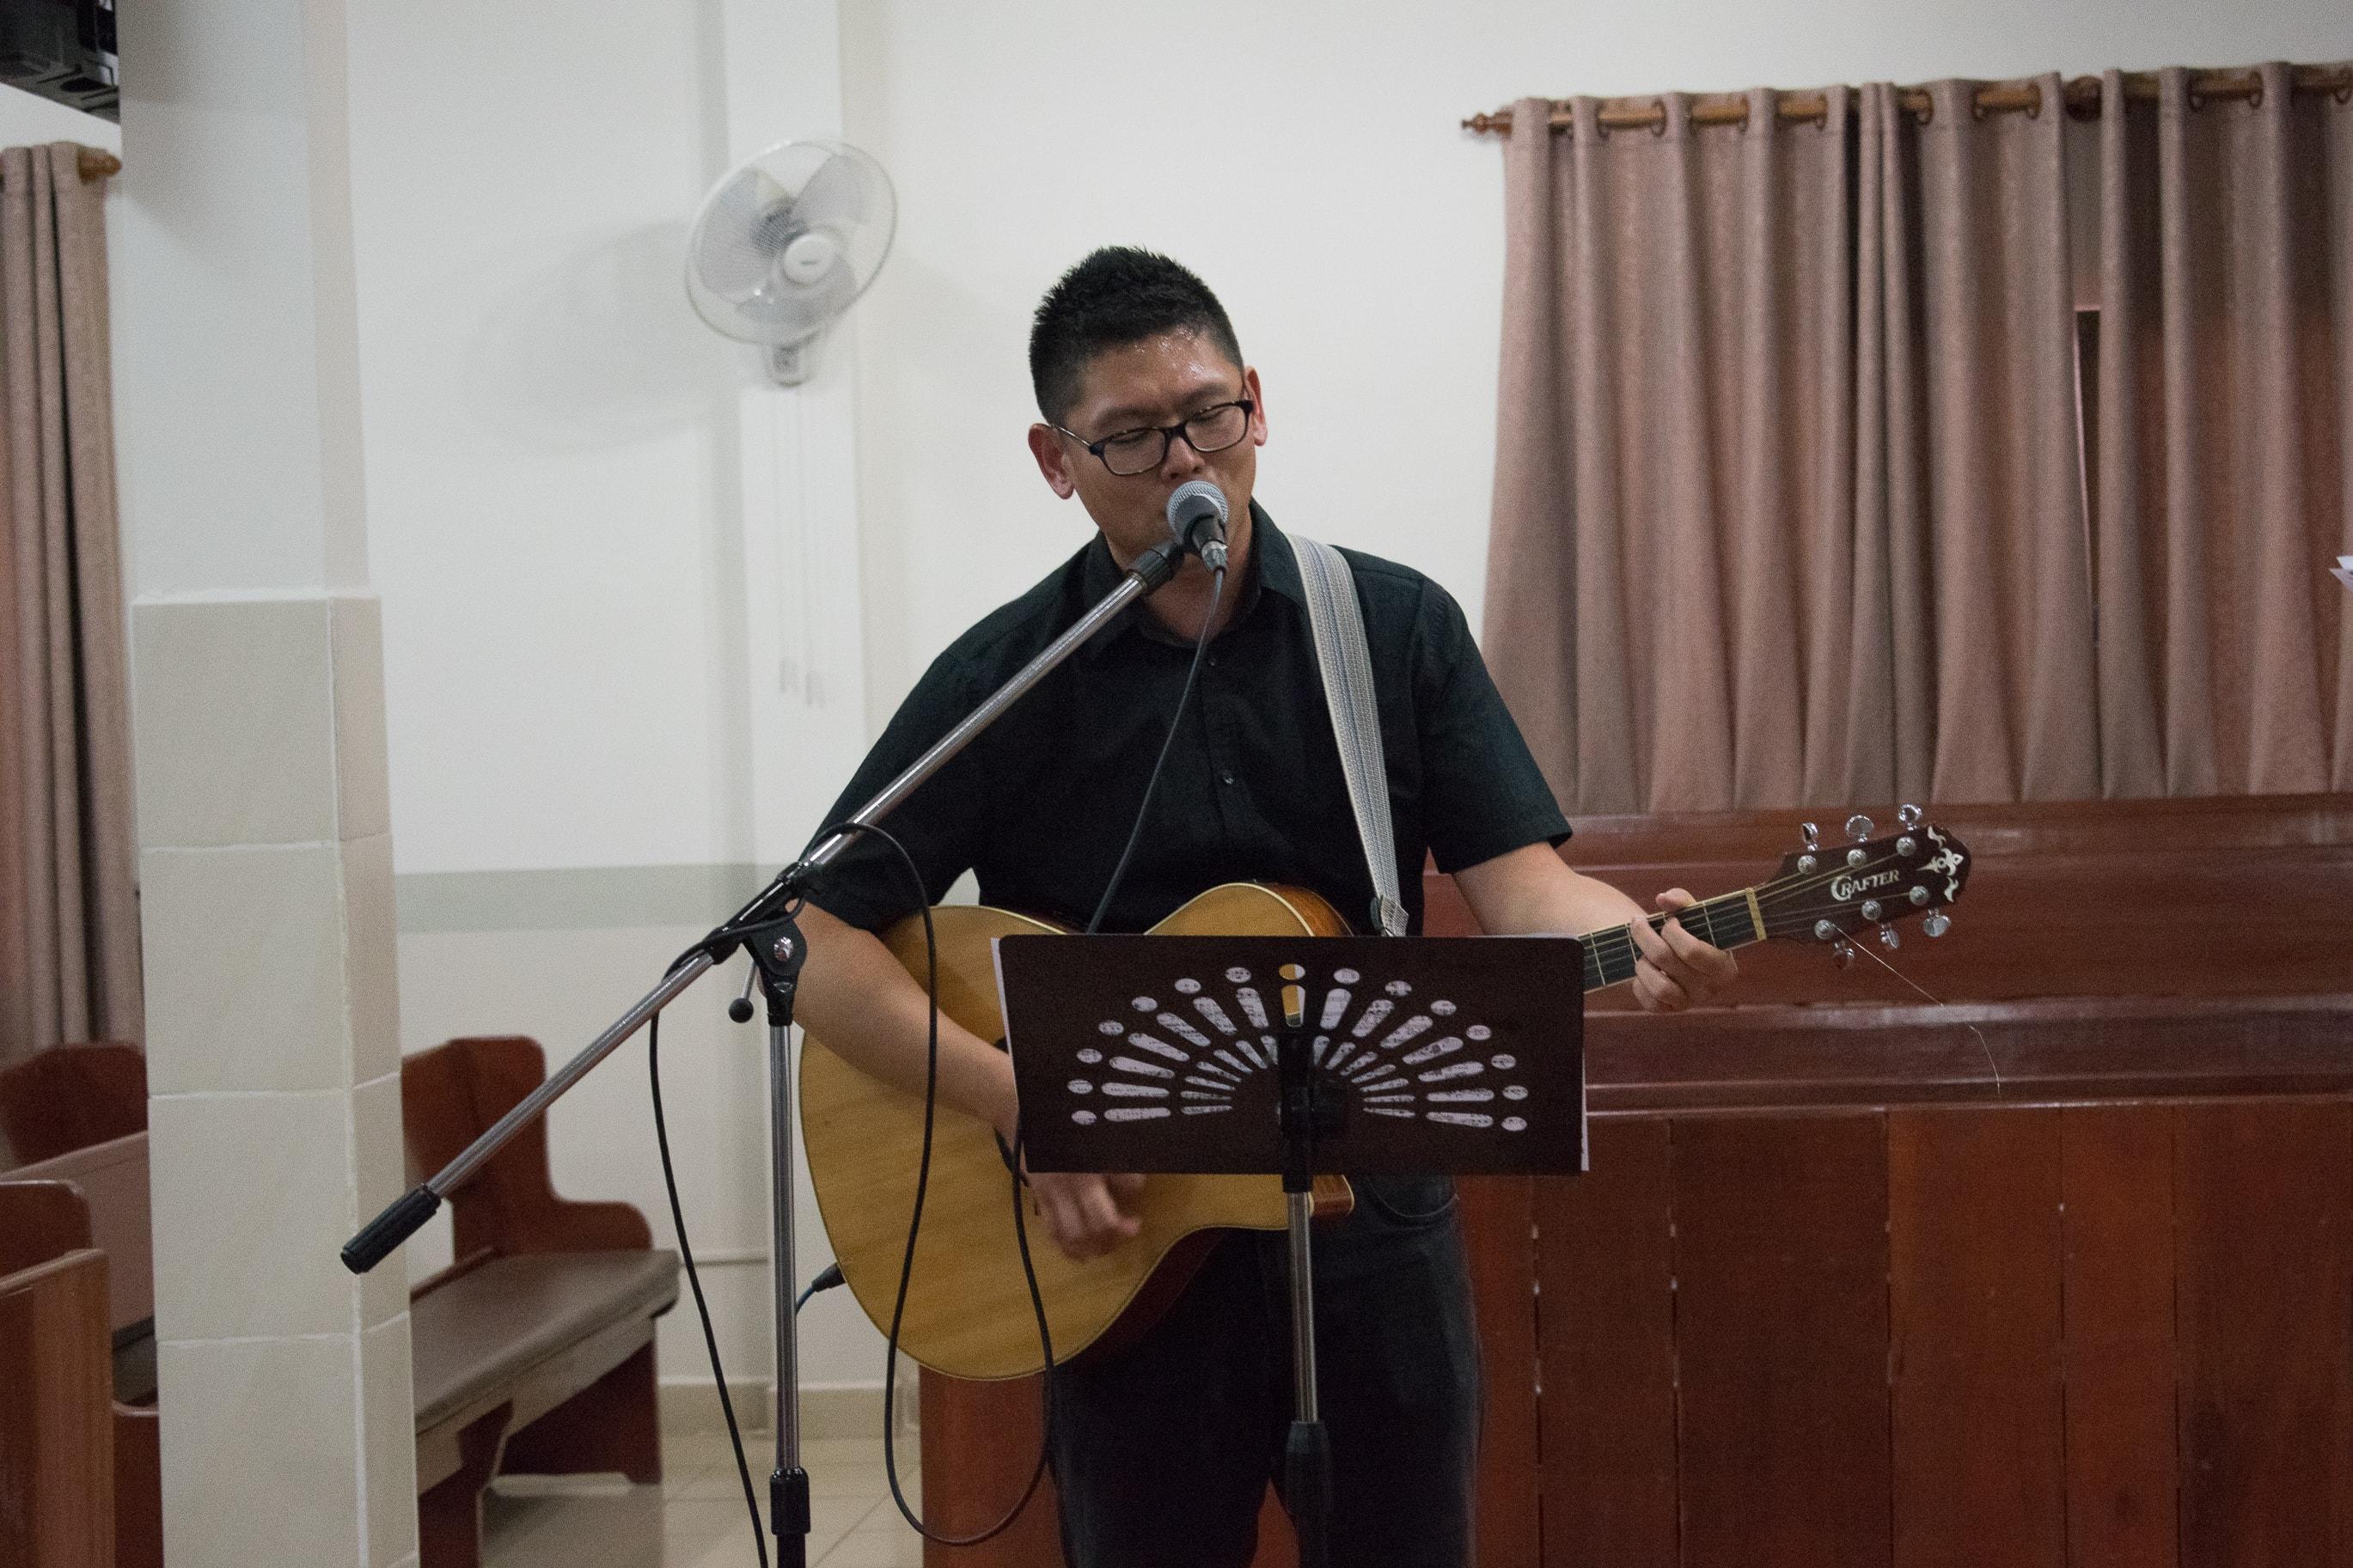 pretty nice 07d3b 385e2 김요한 전도사님께서 찬양인도와 말씀을 전해주셨고 함께 했던 청소년중의 한명 (류하송 학생)이 함께 드럼을 연주해줌으로 찬양팀을  섬겨주었습니다.